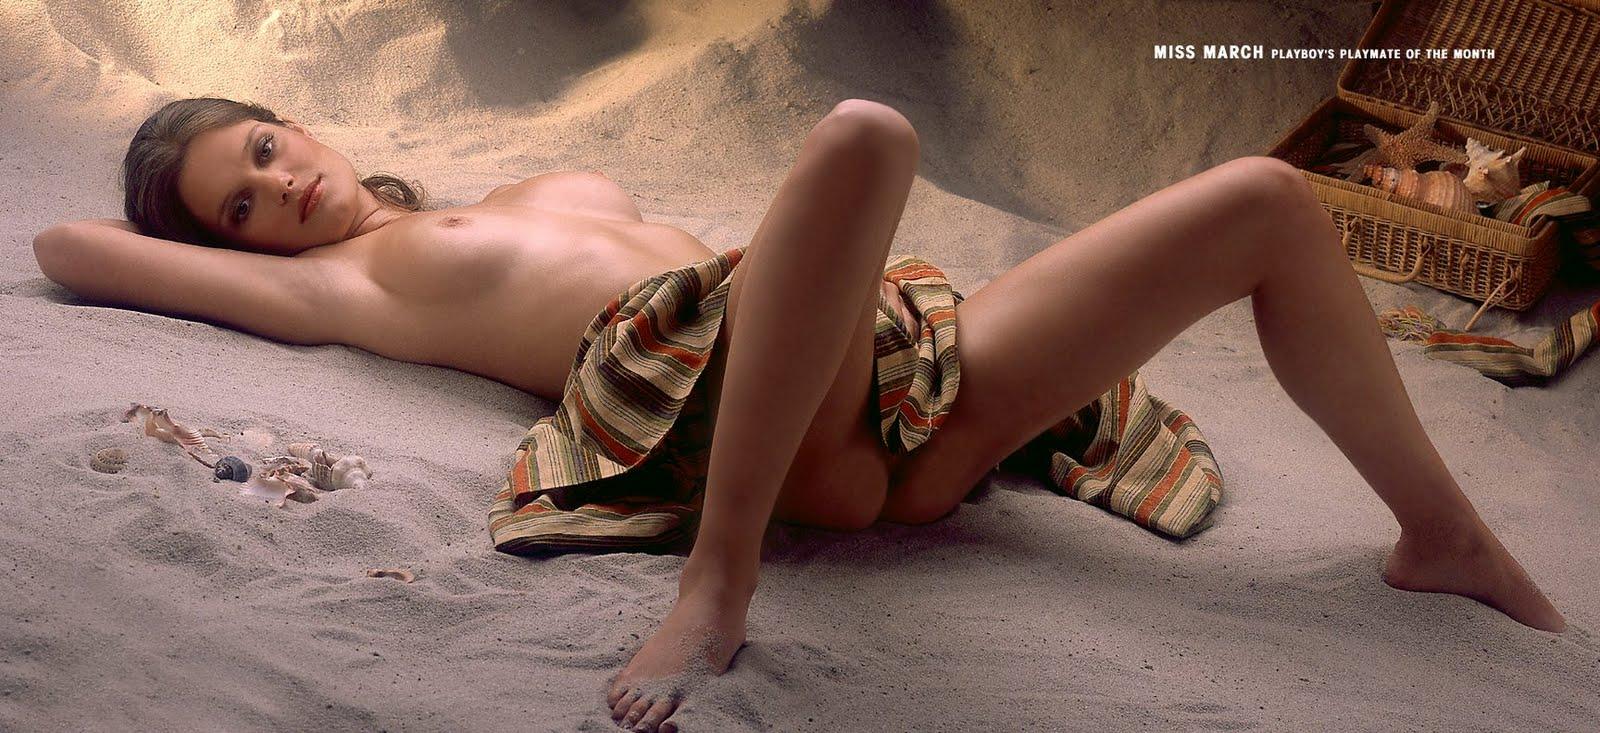 Vintage Playboy Centerfolds 1978 - Hot Girls Wallpaper